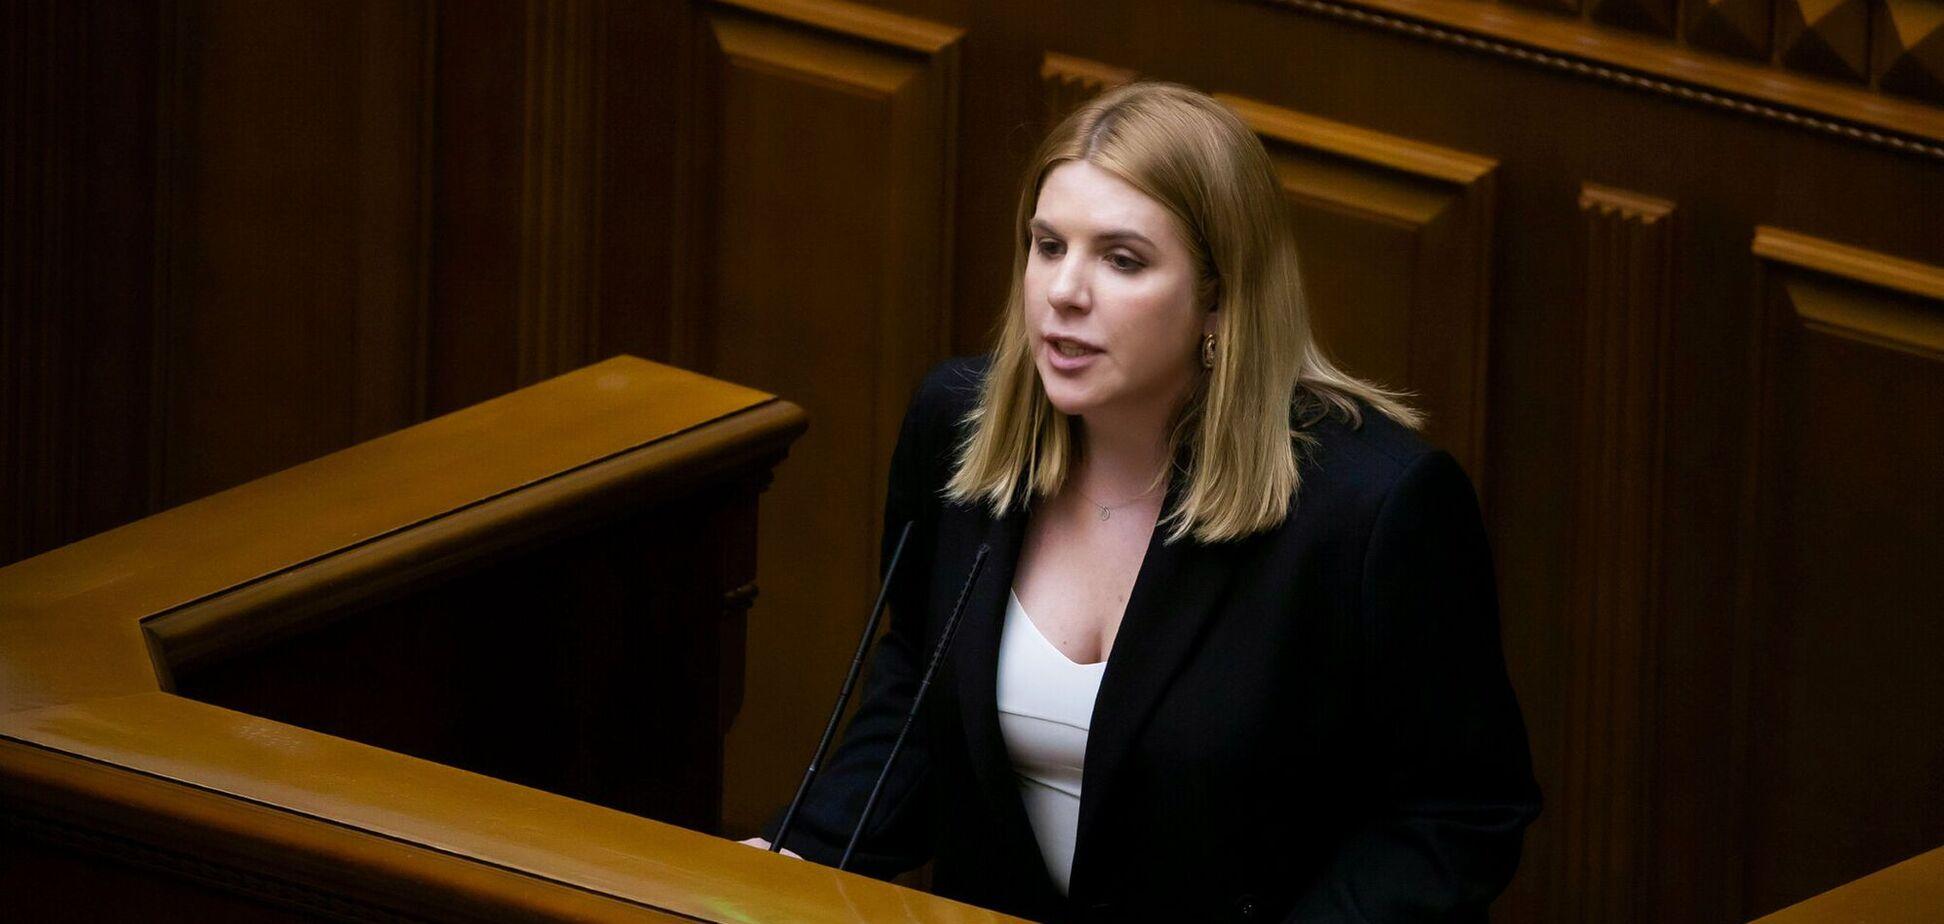 Лидер партии 'Голос' Кира Рудик